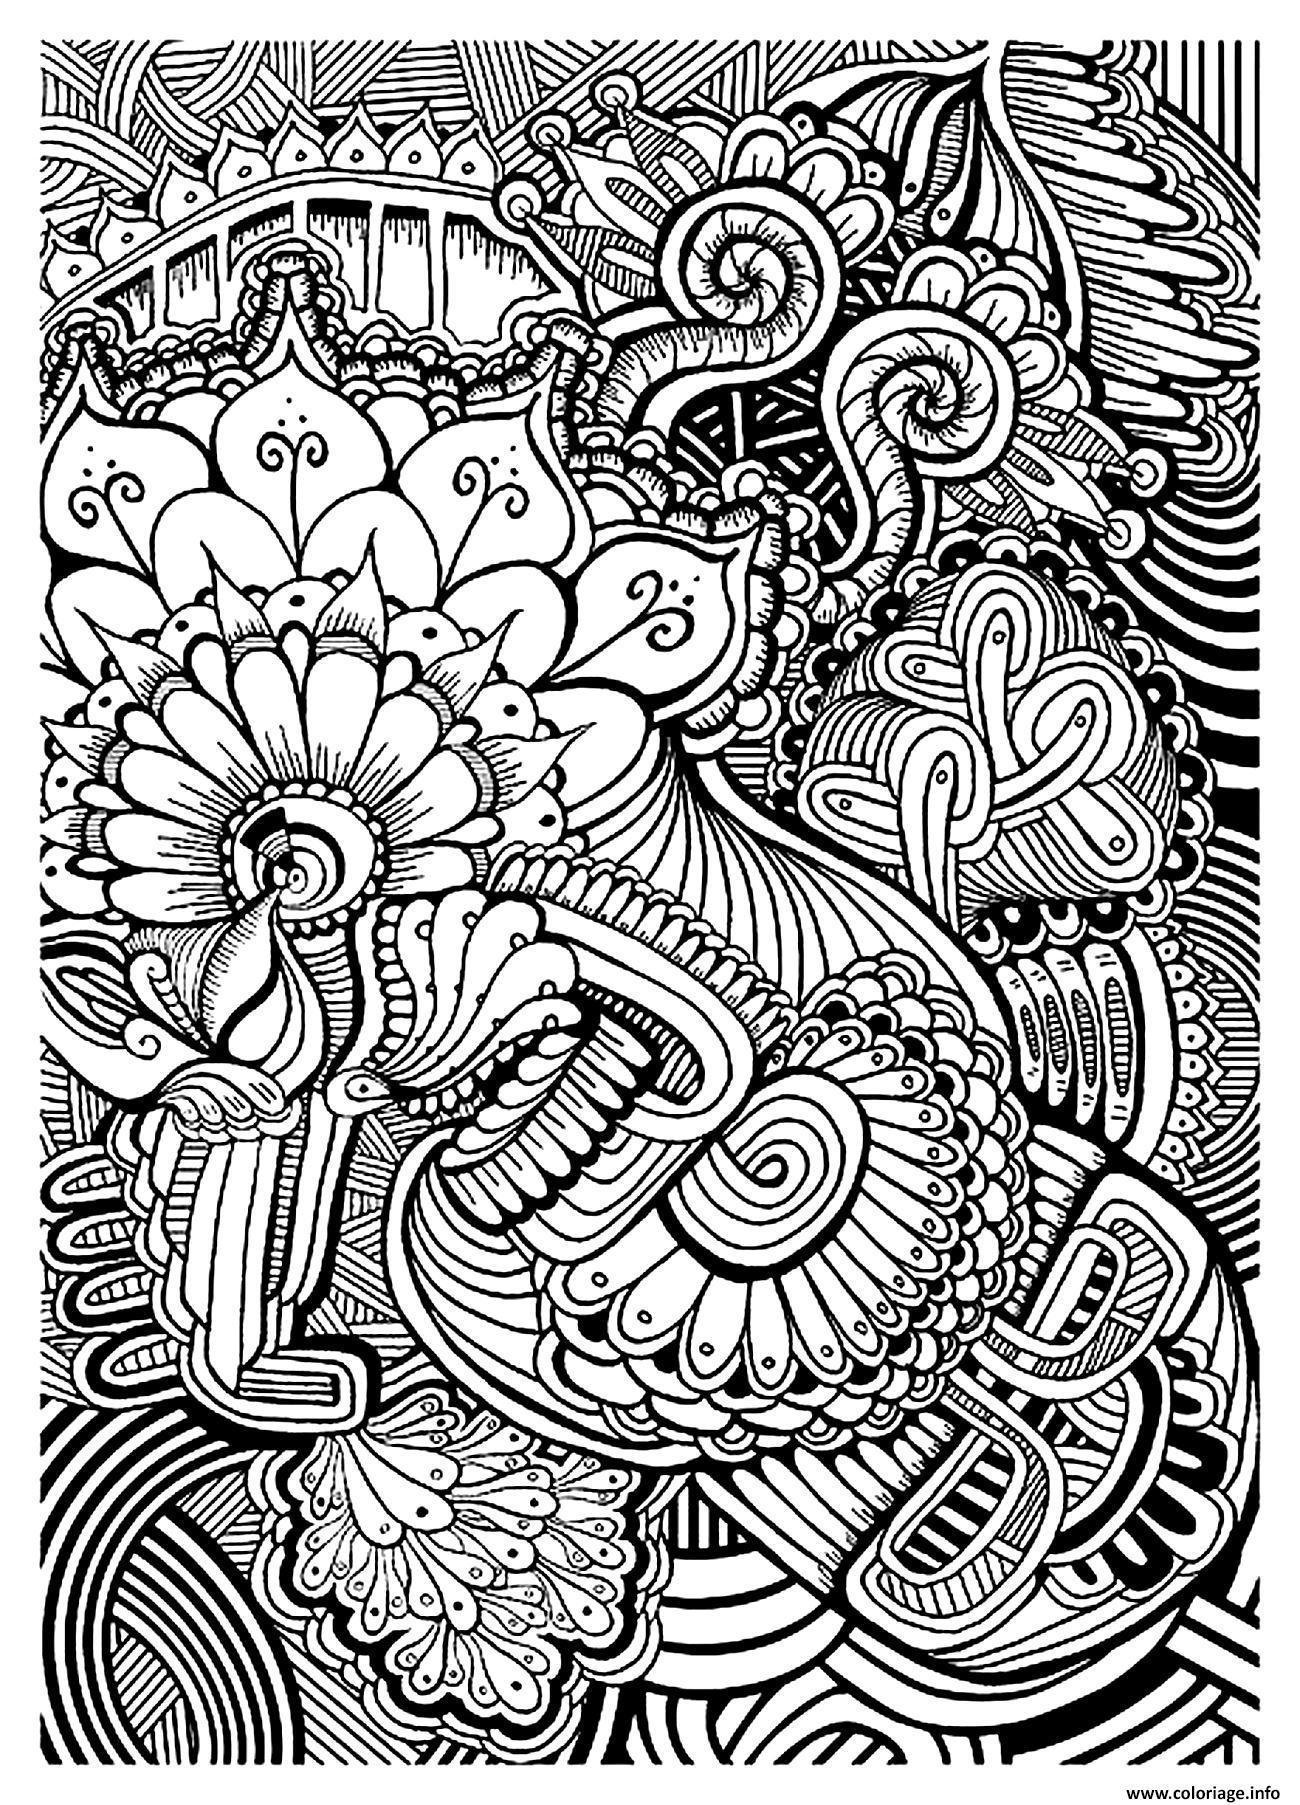 coloriage adulte zen anti stress relax a imprimer dessin imprimer - Coloriage Imprimer Adulte